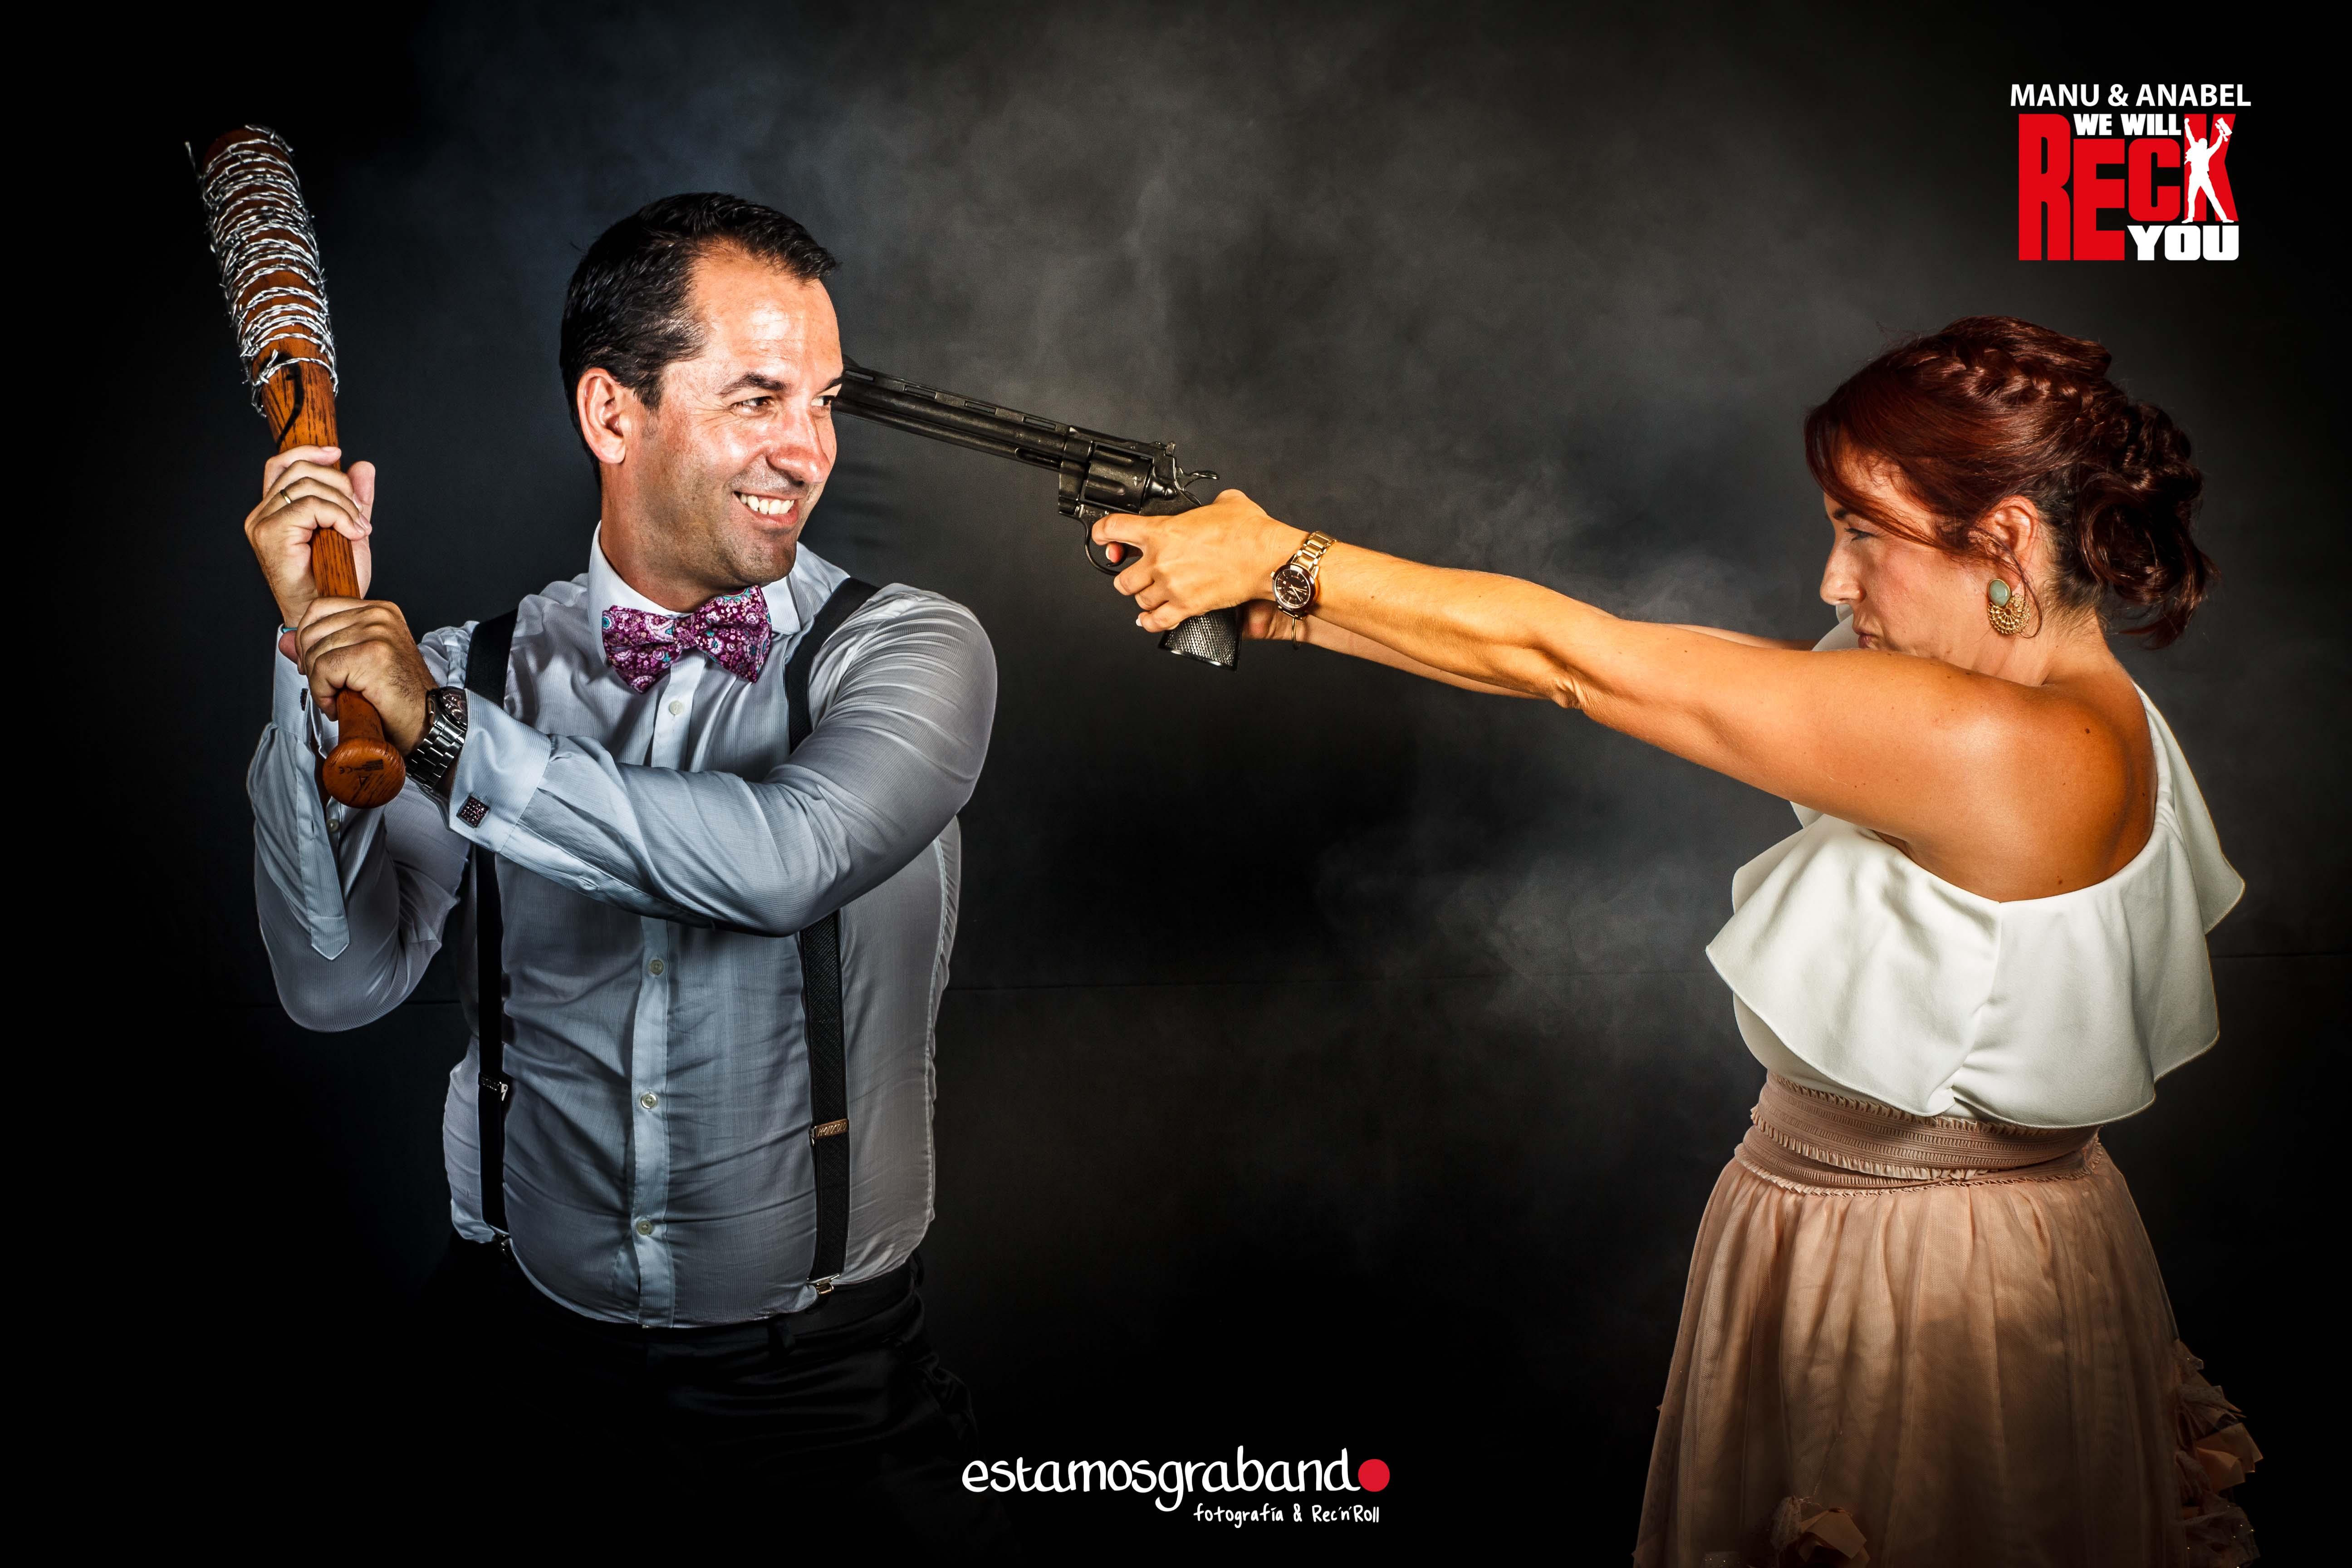 Fotocall-Recandroller_Manu-Anabel-19 Fotocall Recandroller Manu + Anabel _ Jerez de la Frontera - video boda cadiz